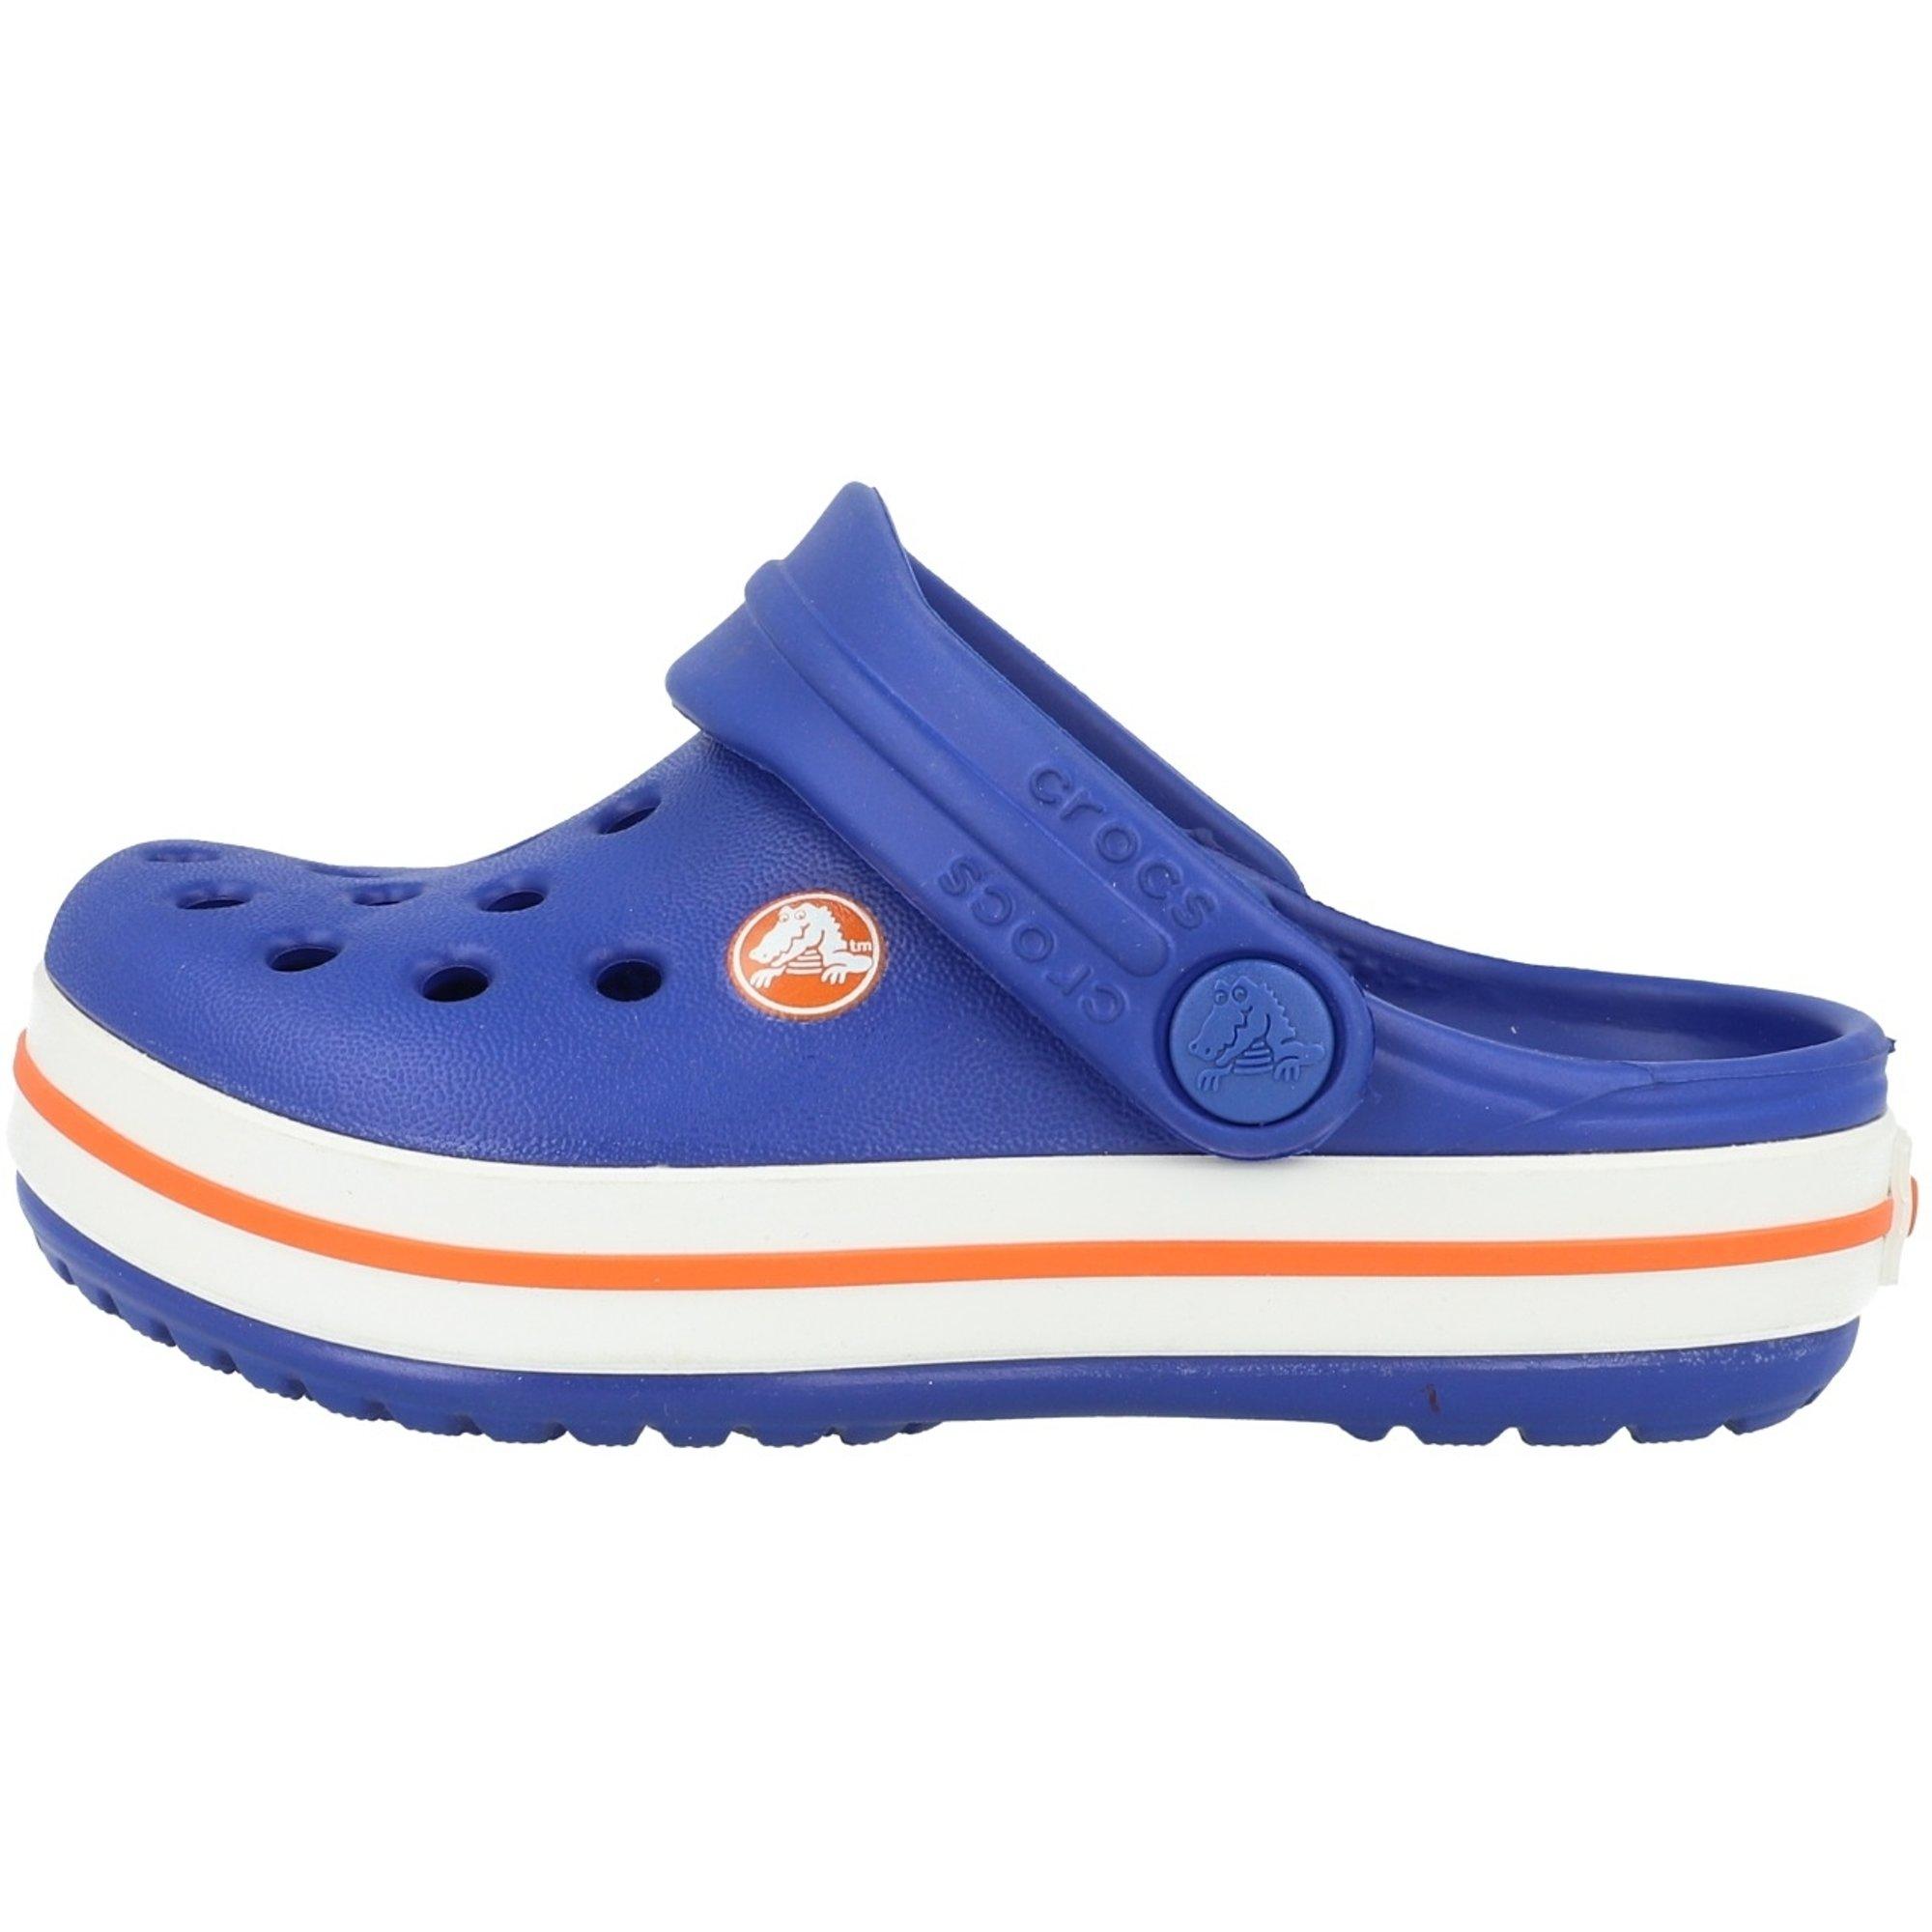 Crocs Kids Crocband Clog Cerulean Blue Croslite